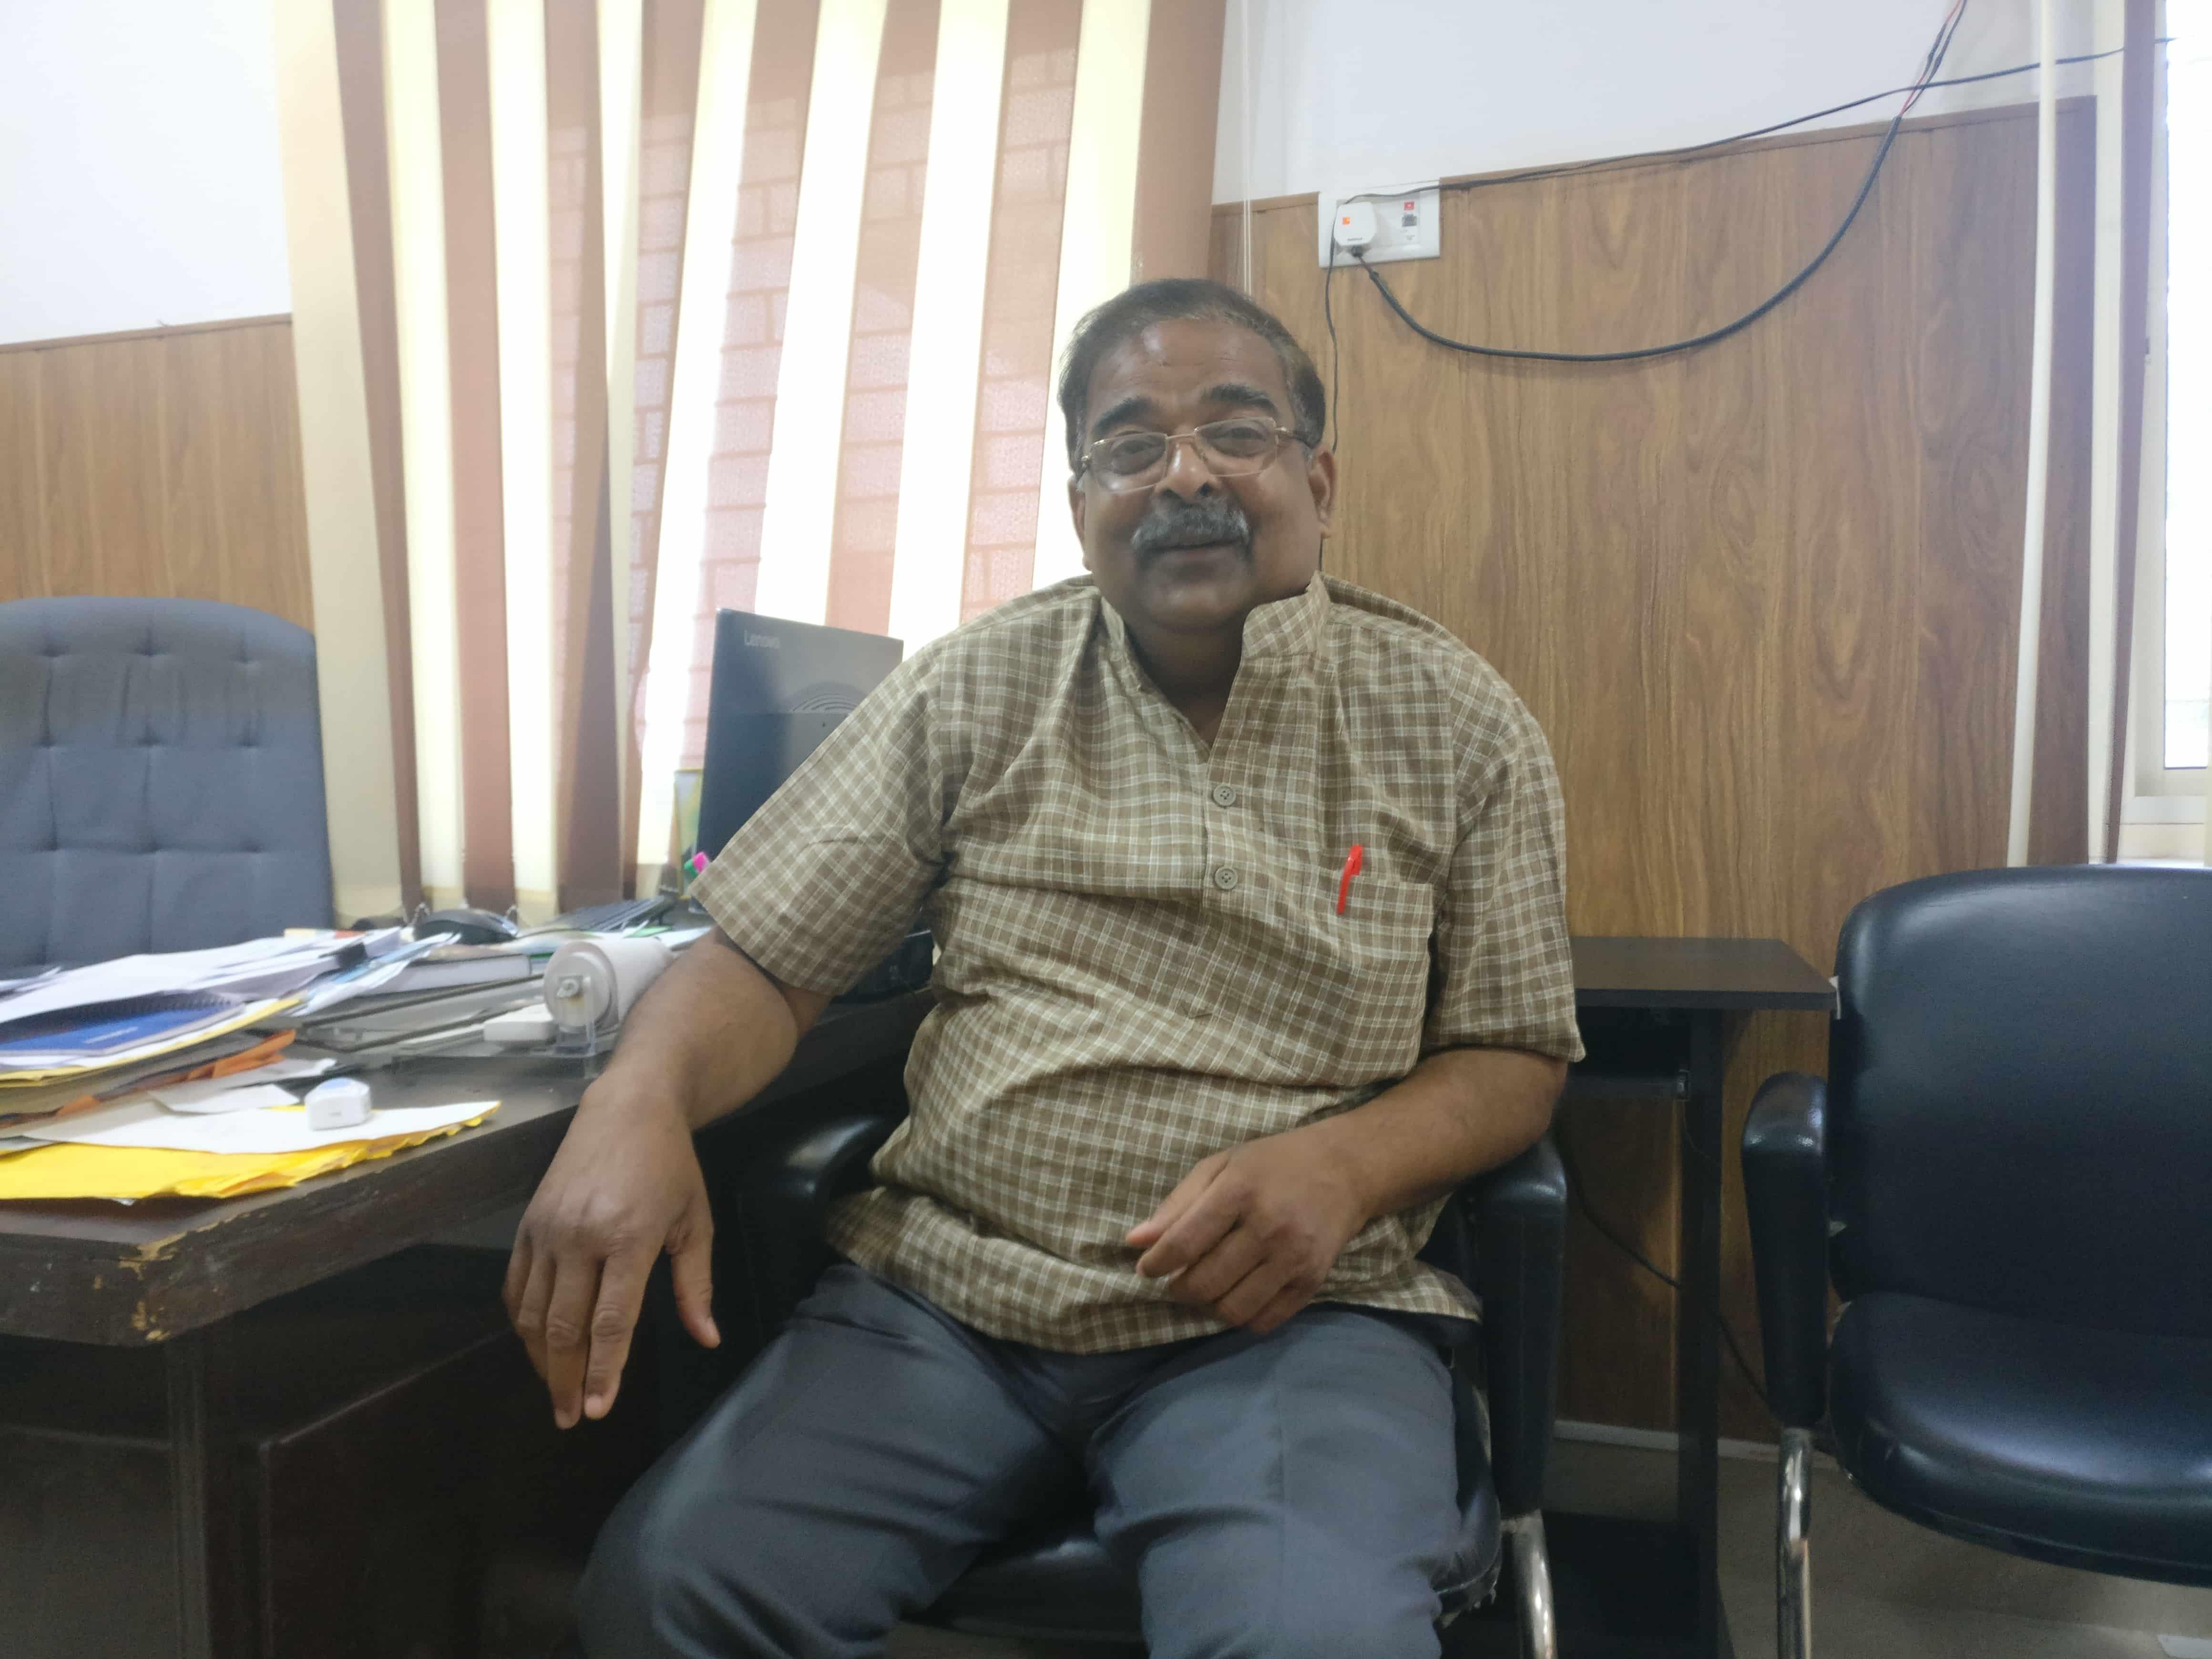 Ajay Bisaria, a seventh-generation resident of Aligarh, teaches Hindi at the Aligarh Muslim University. Photo credit: Shreya Roy Chowdhury